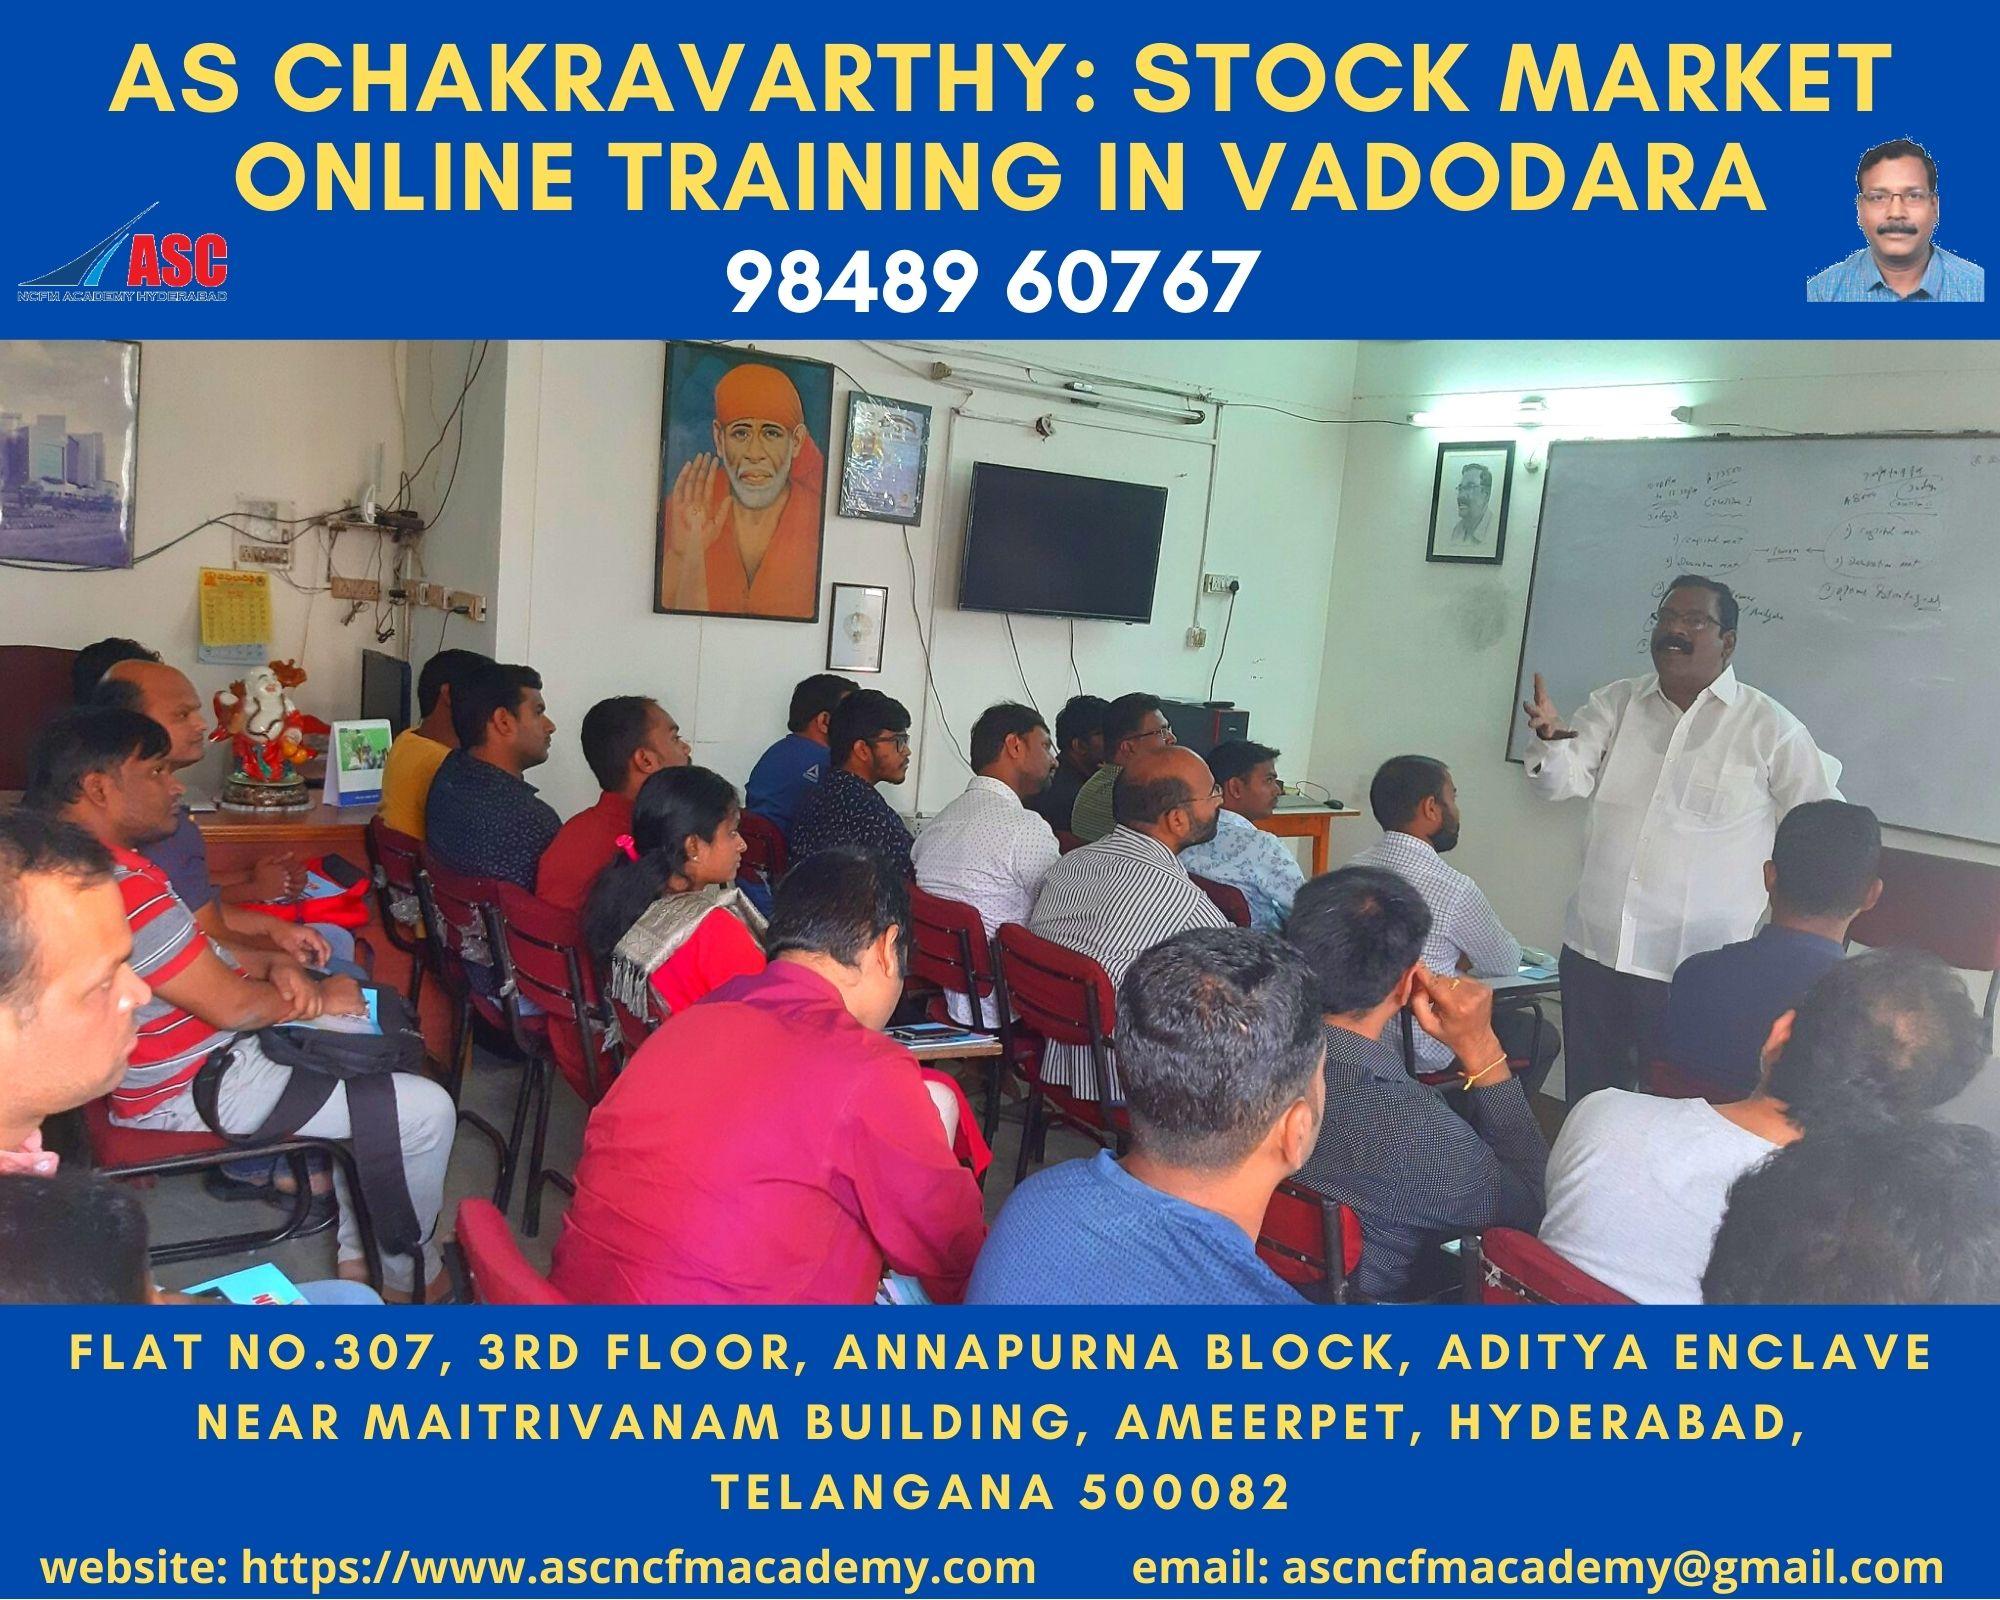 Online Stock Market Technical Training in Hindi Vadodara